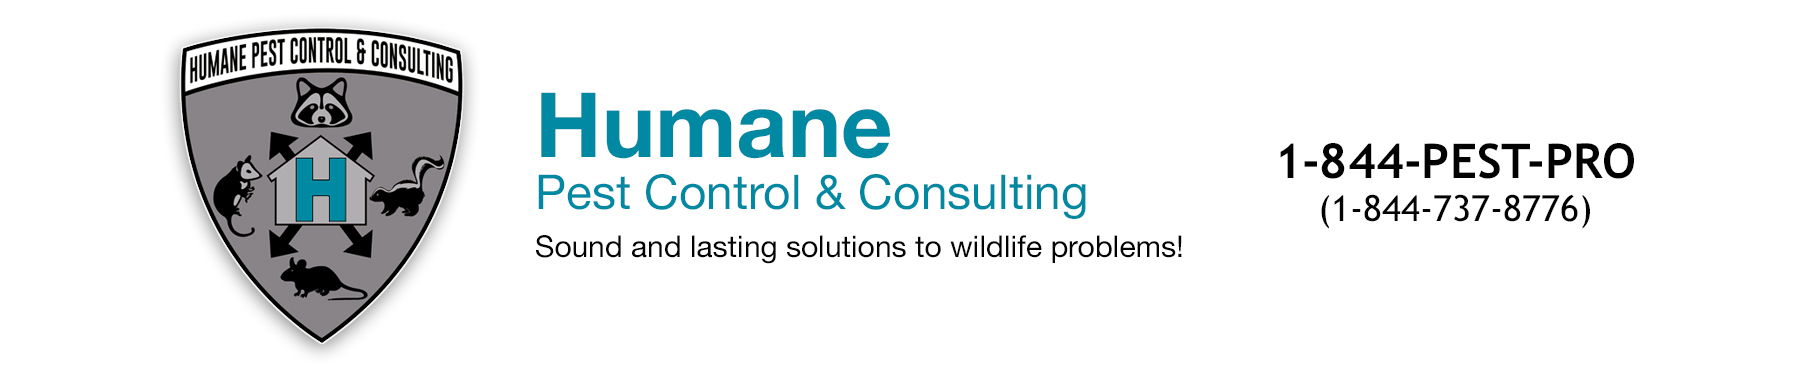 Humane Pest Control & Consulting